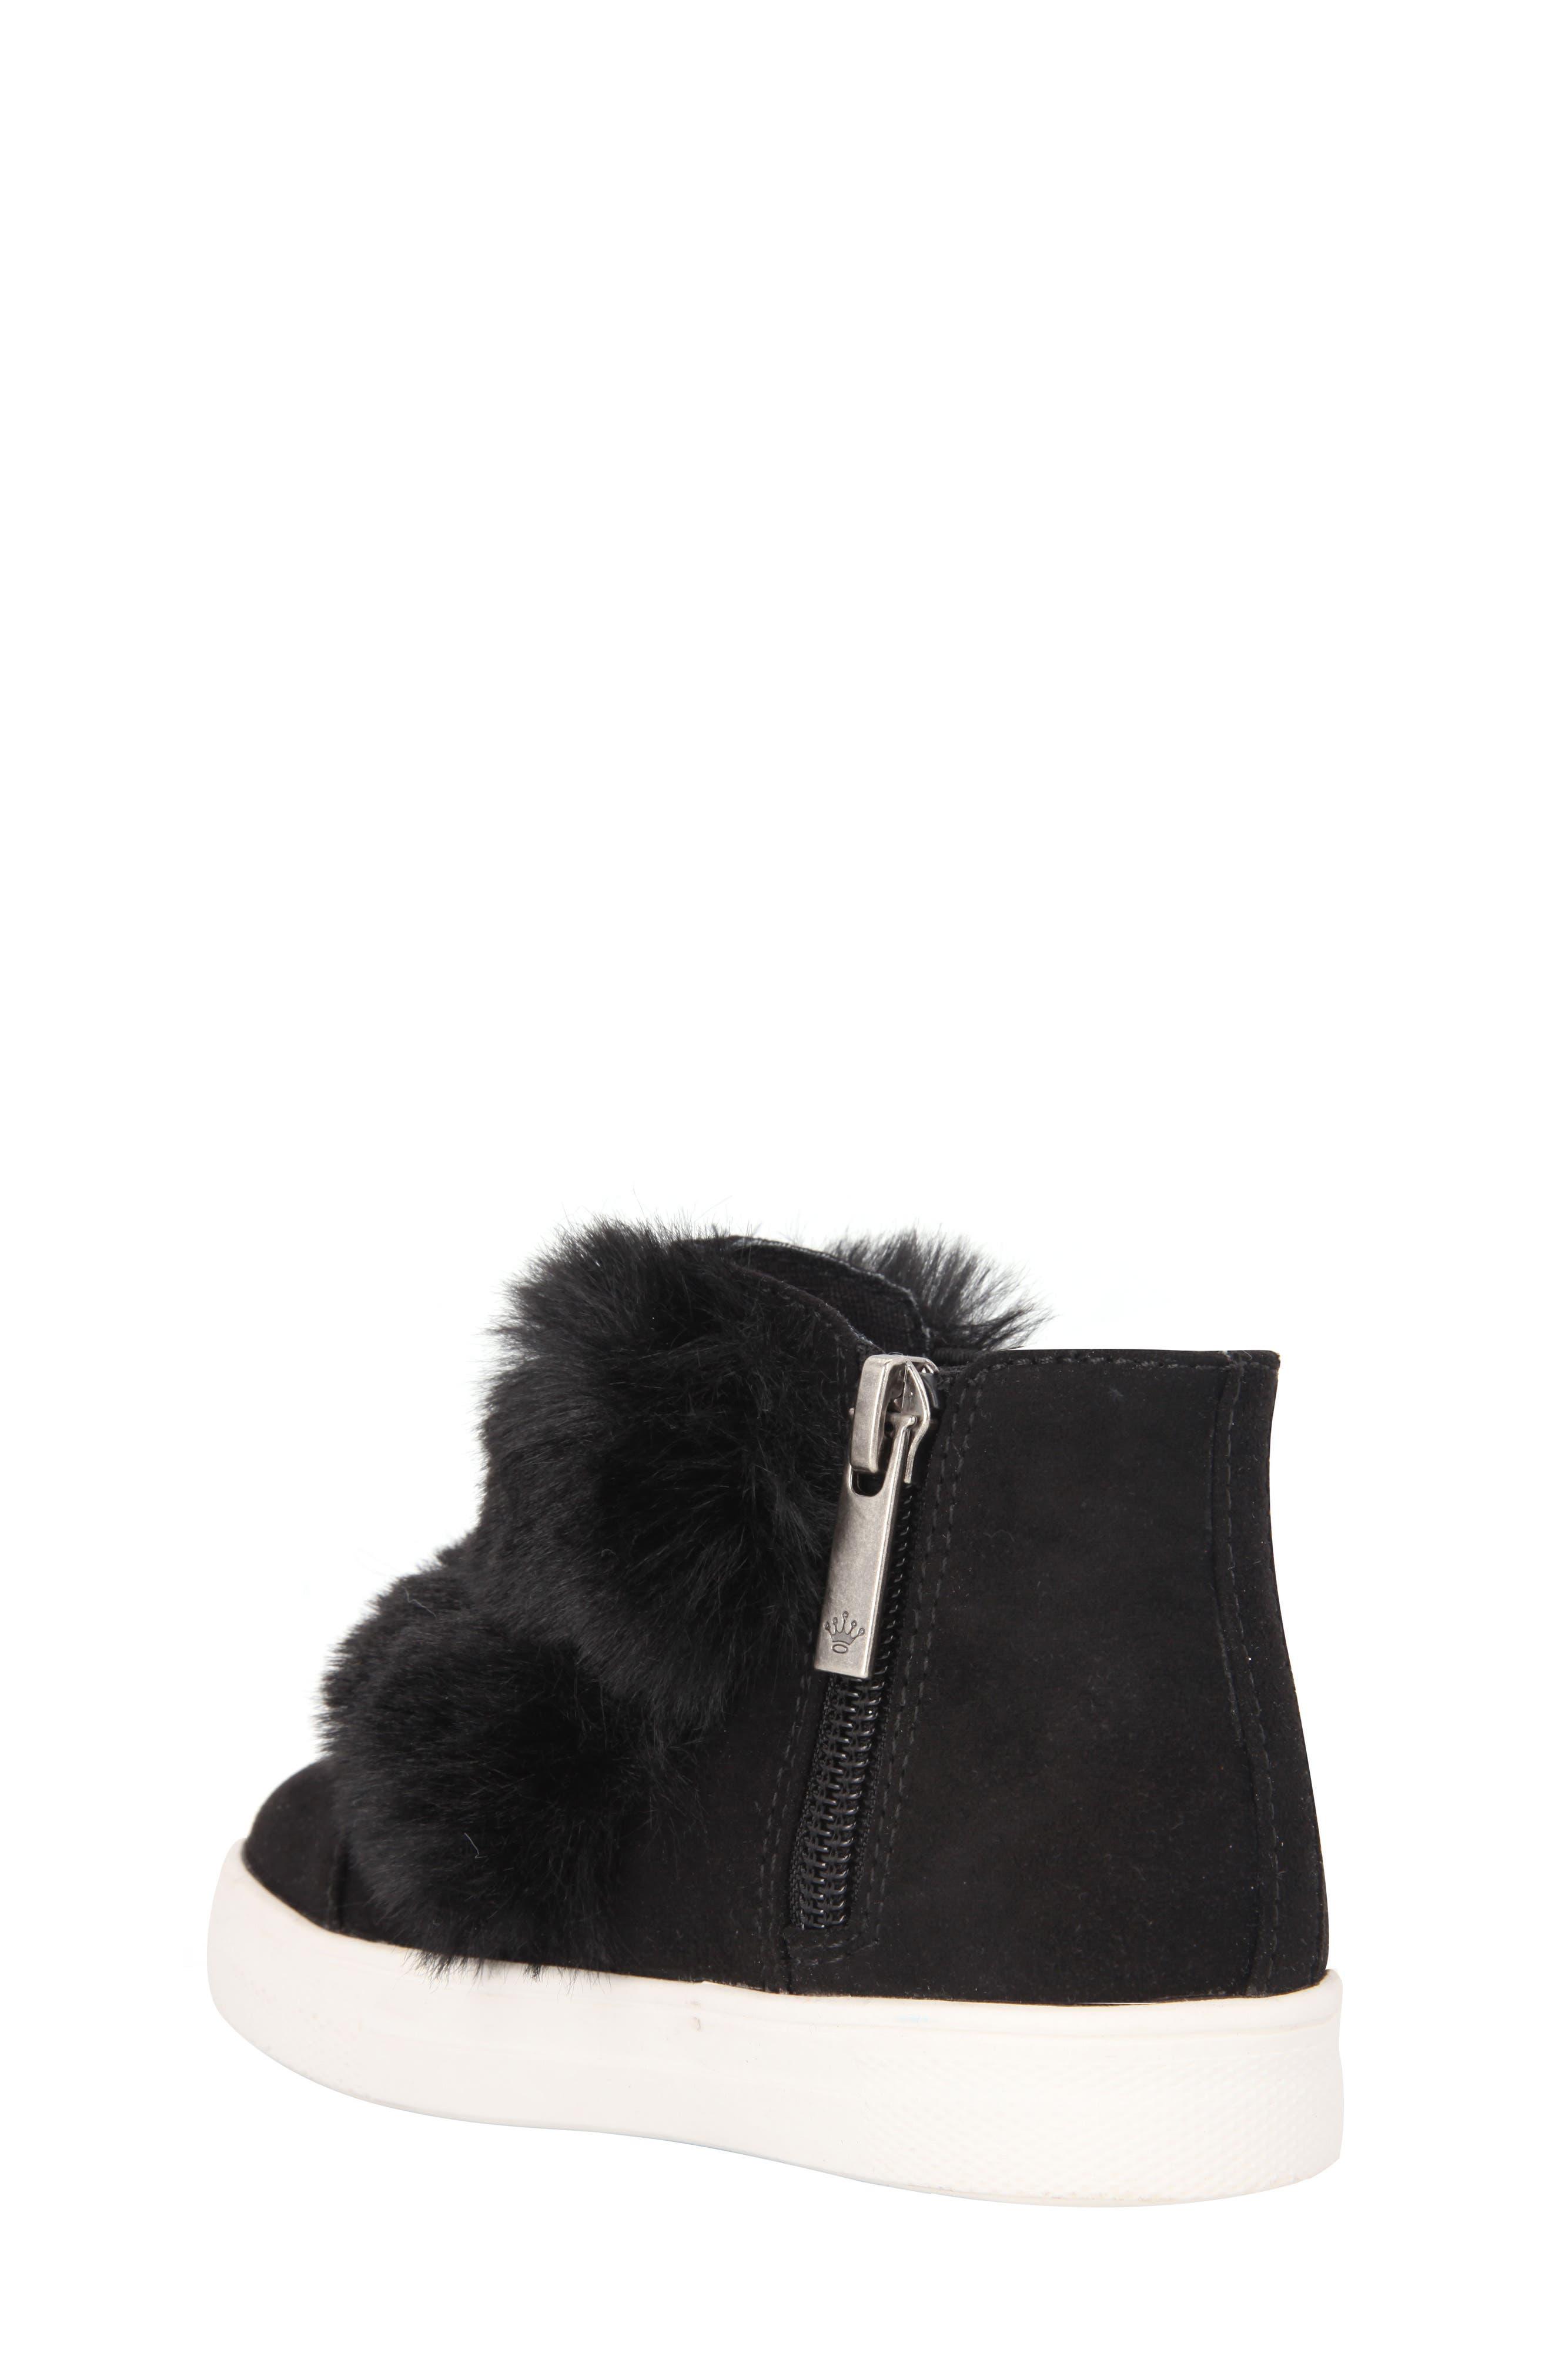 Helen Faux Fur Bootie Sneaker,                             Alternate thumbnail 2, color,                             Black Microsuede